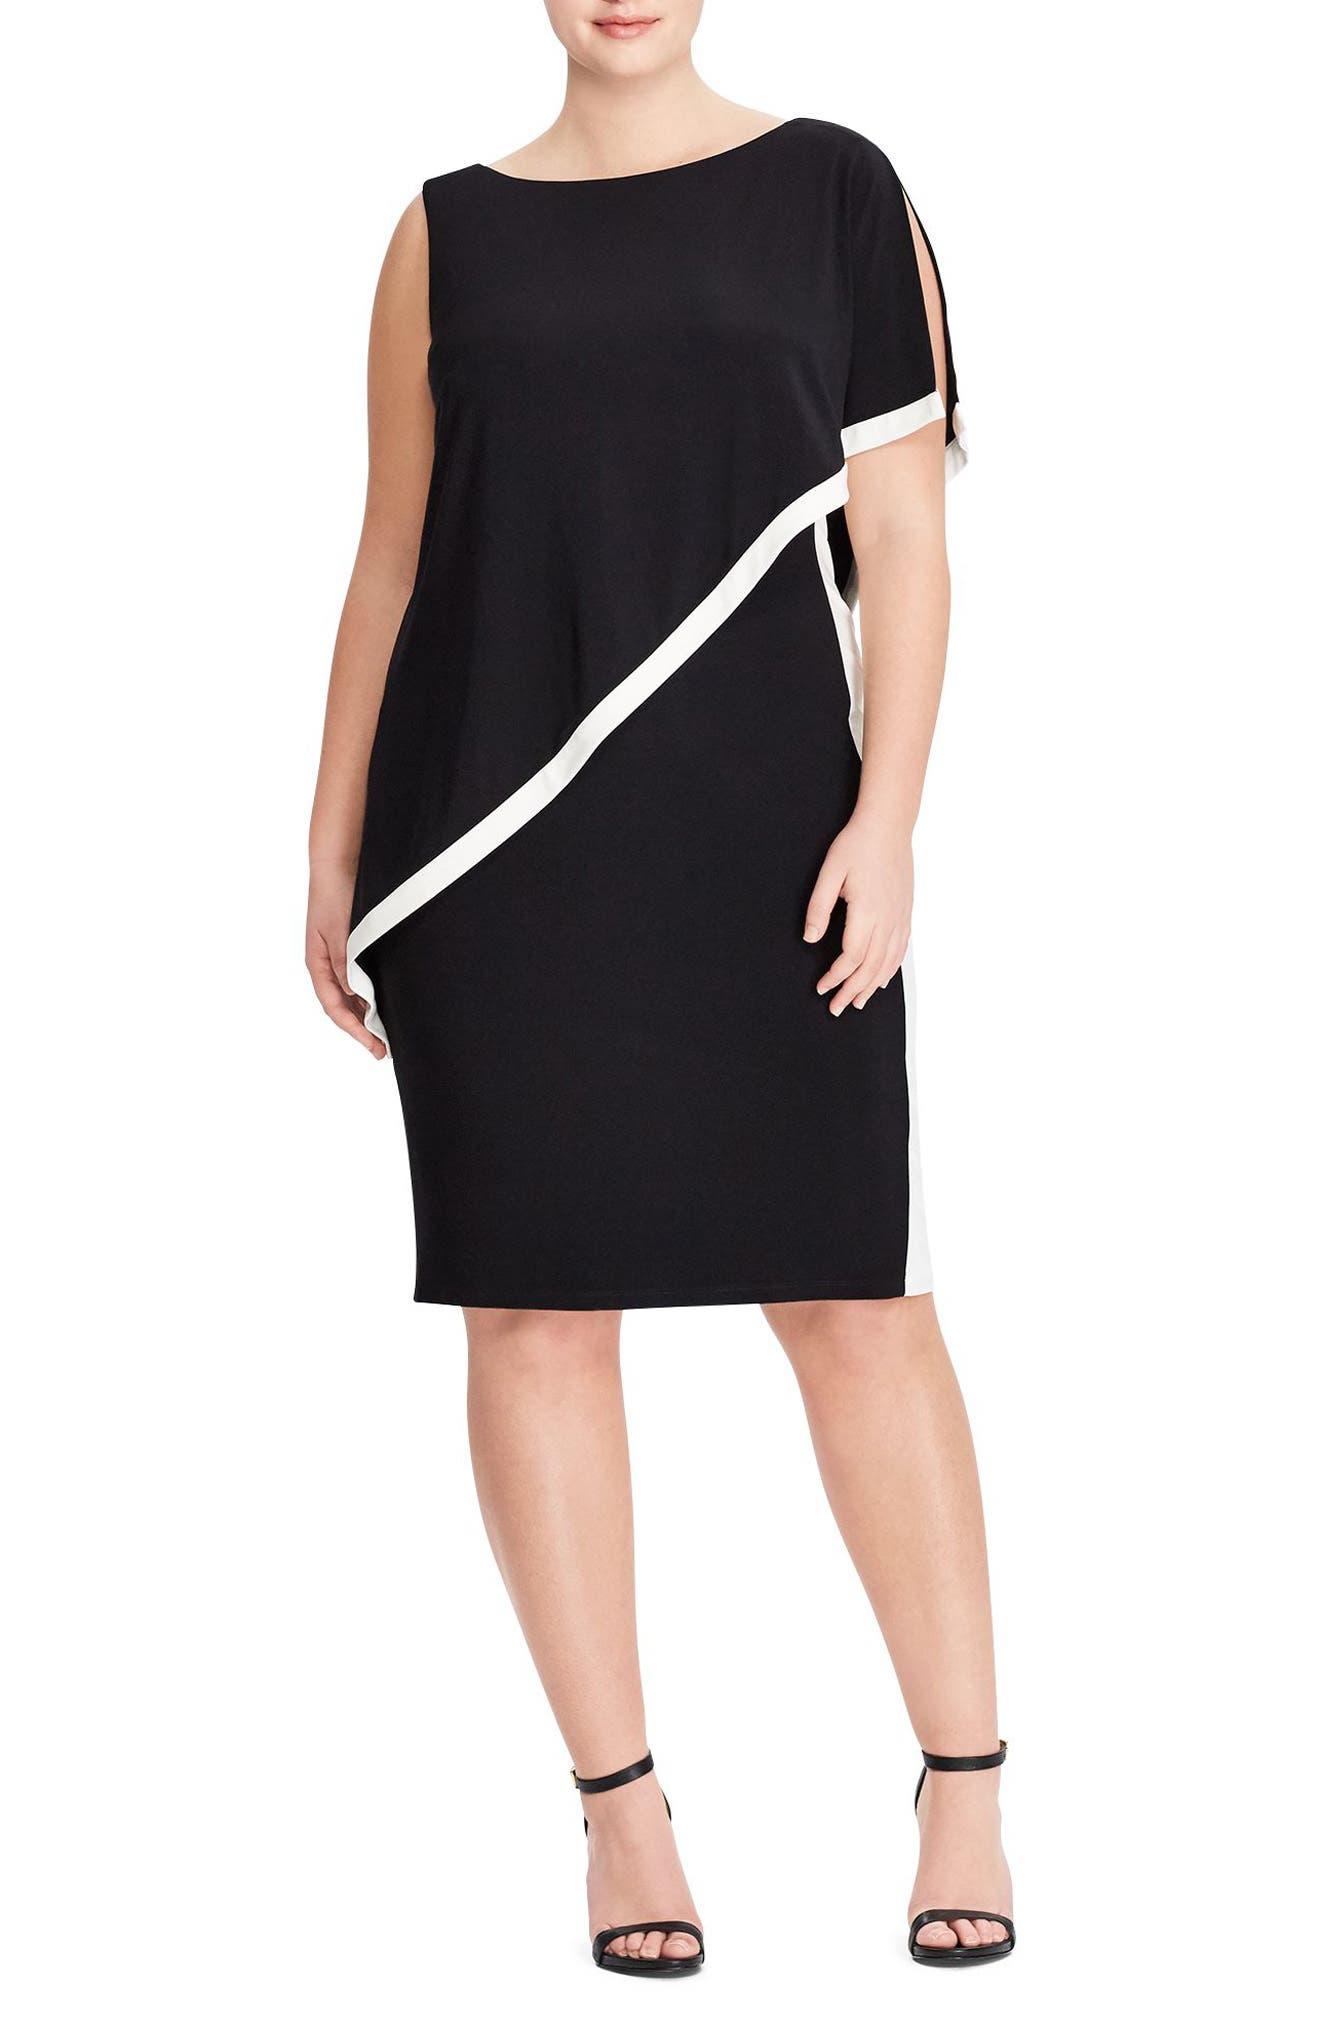 Cape Overlay Sheath Dress,                             Main thumbnail 1, color,                             Black-Lauren White